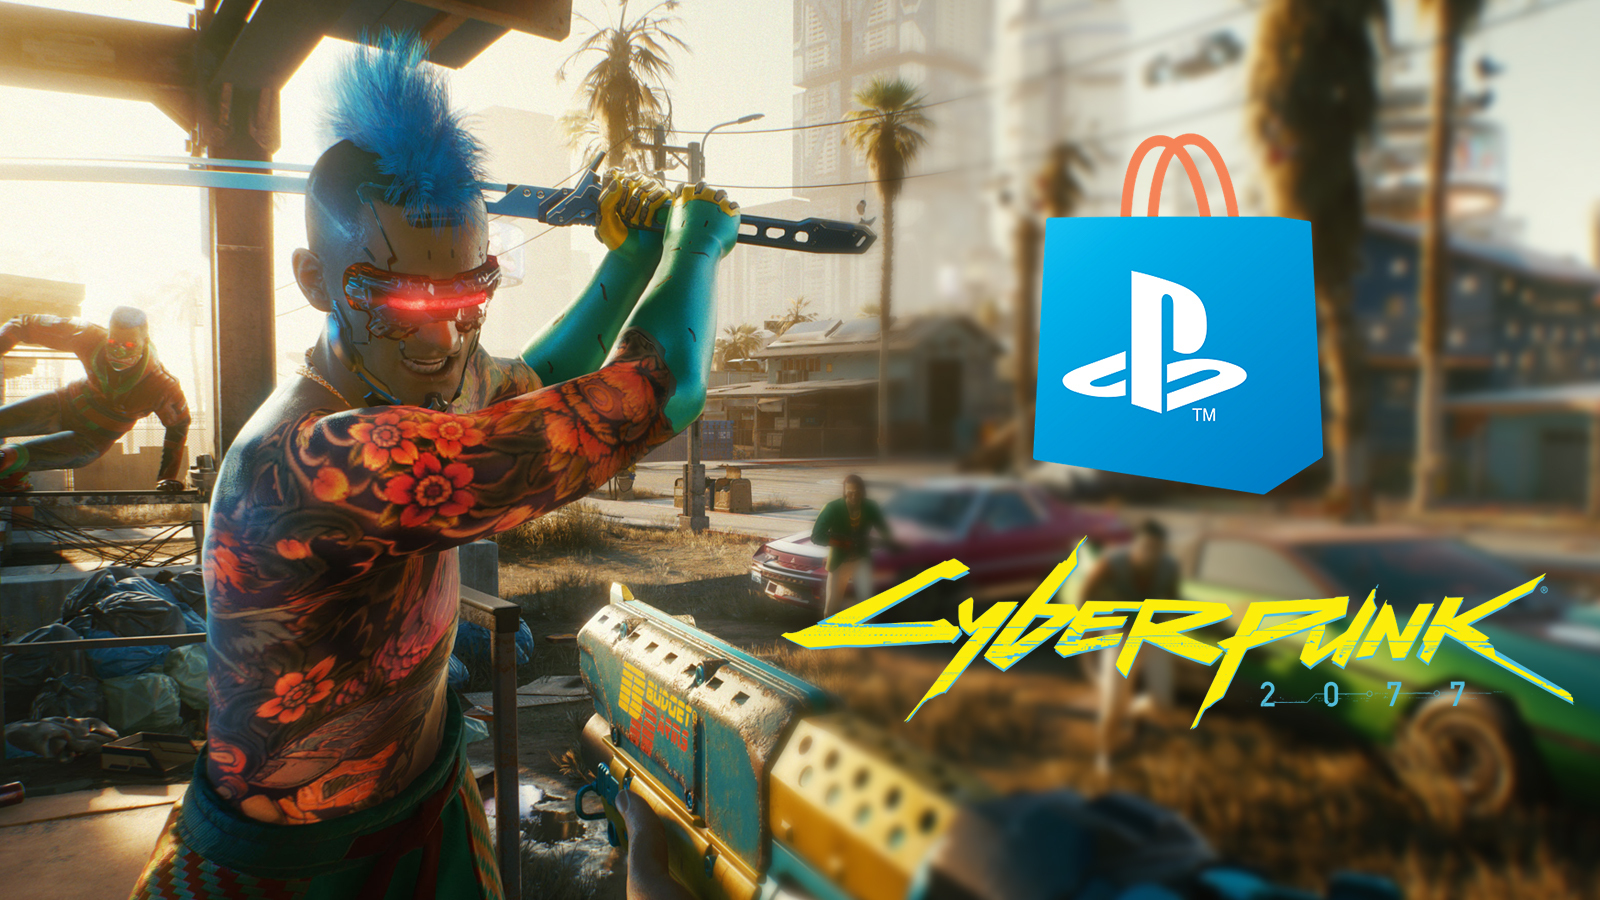 Cyberpunk 2077 удалили из онлайн-магазина PlayStation из-за жалоб игроков